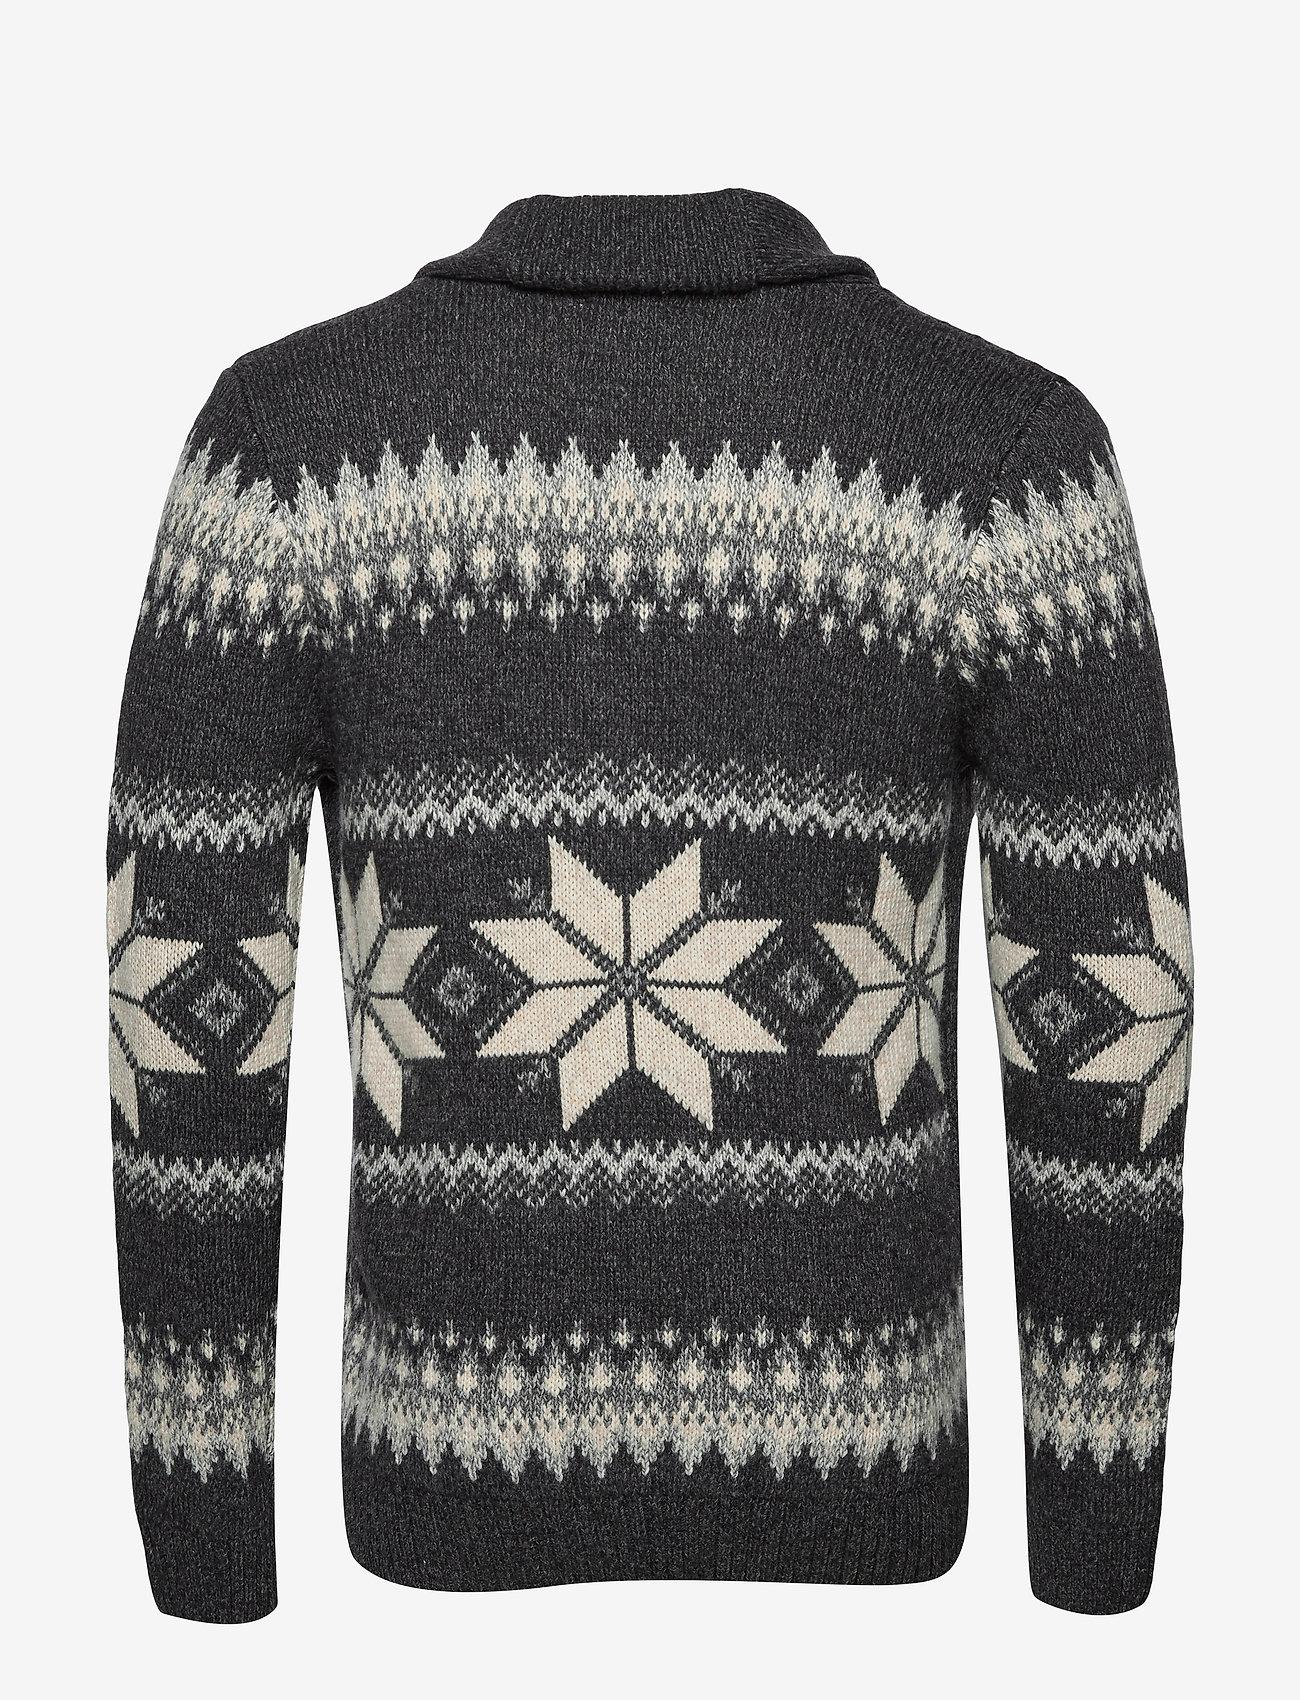 Abercrombie & Fitch Moose Shawl - Knitwear